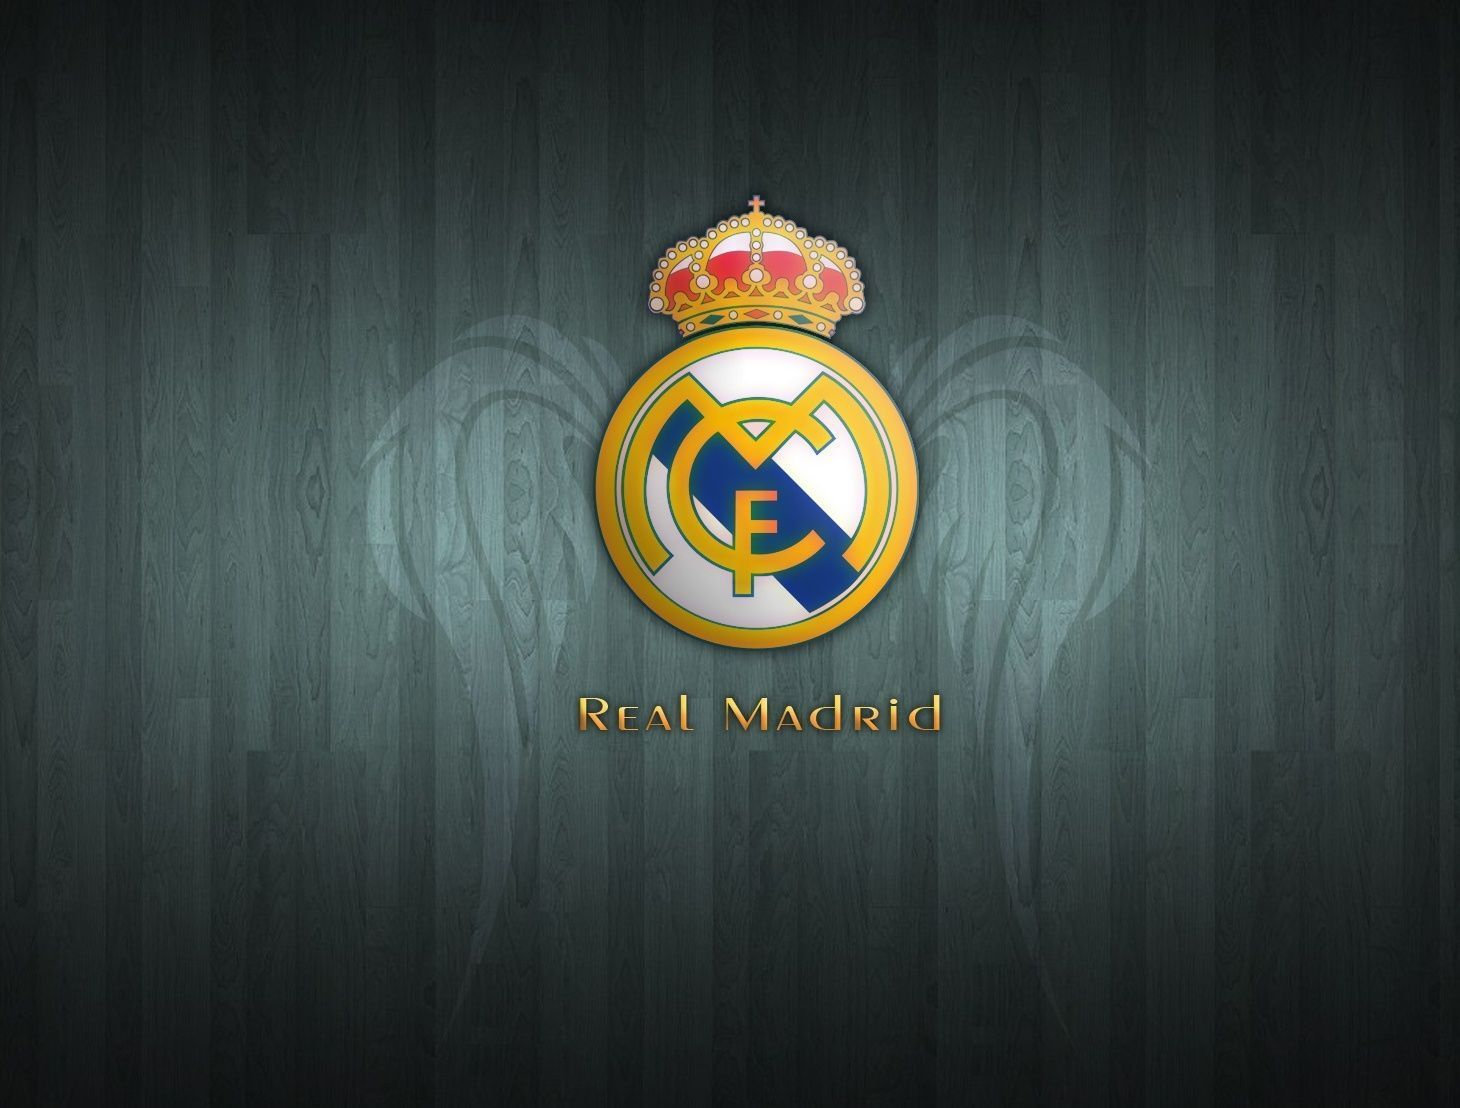 Real Madrid Club De Futbol Madrid Espana Wallpaper Best Wallpaper Hd Real Madrid Wallpapers Real Madrid Logo Wallpapers Madrid Wallpaper